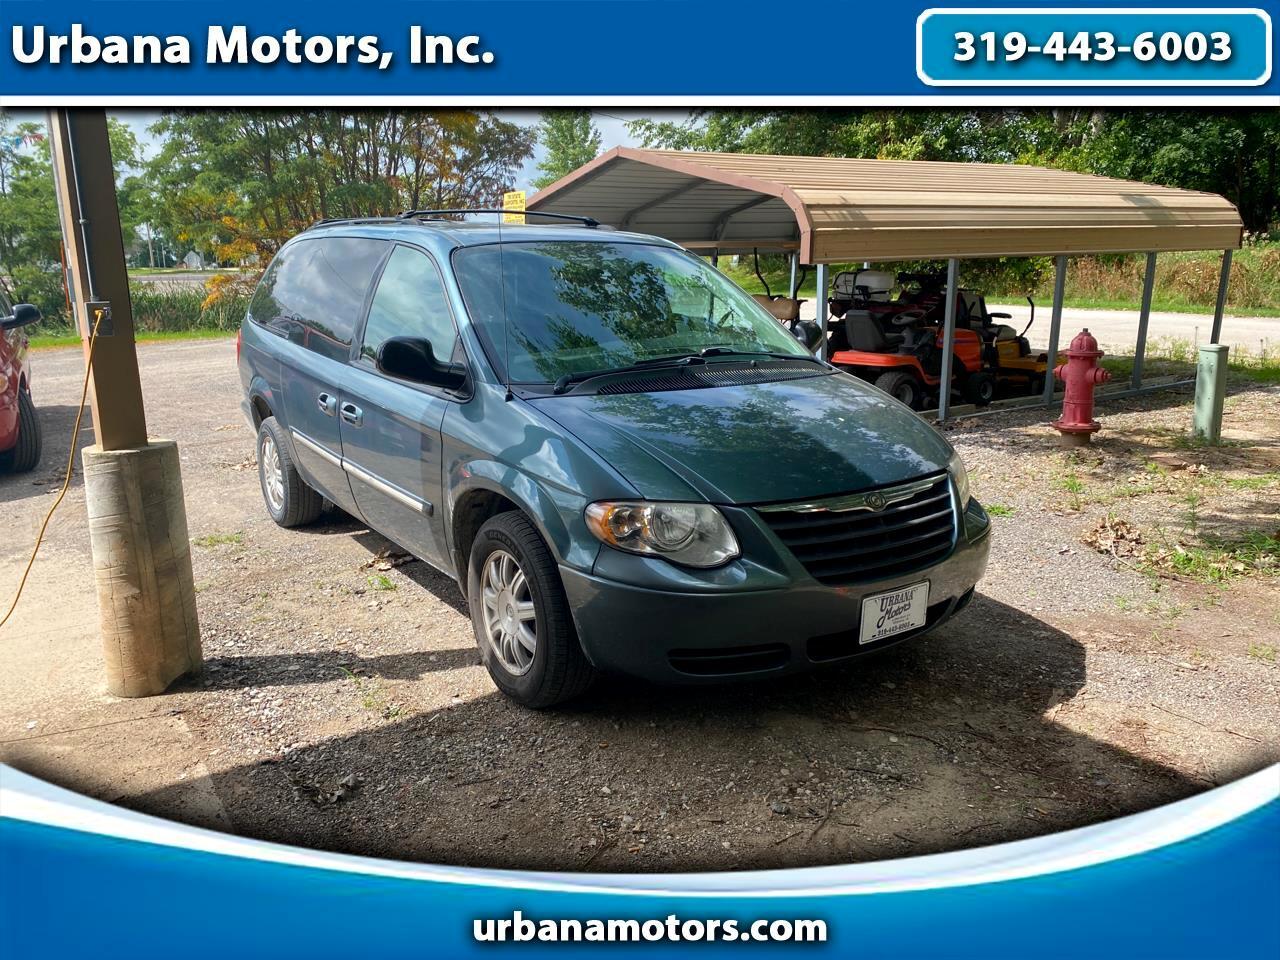 2006 Chrysler Town & Country Urbana IA